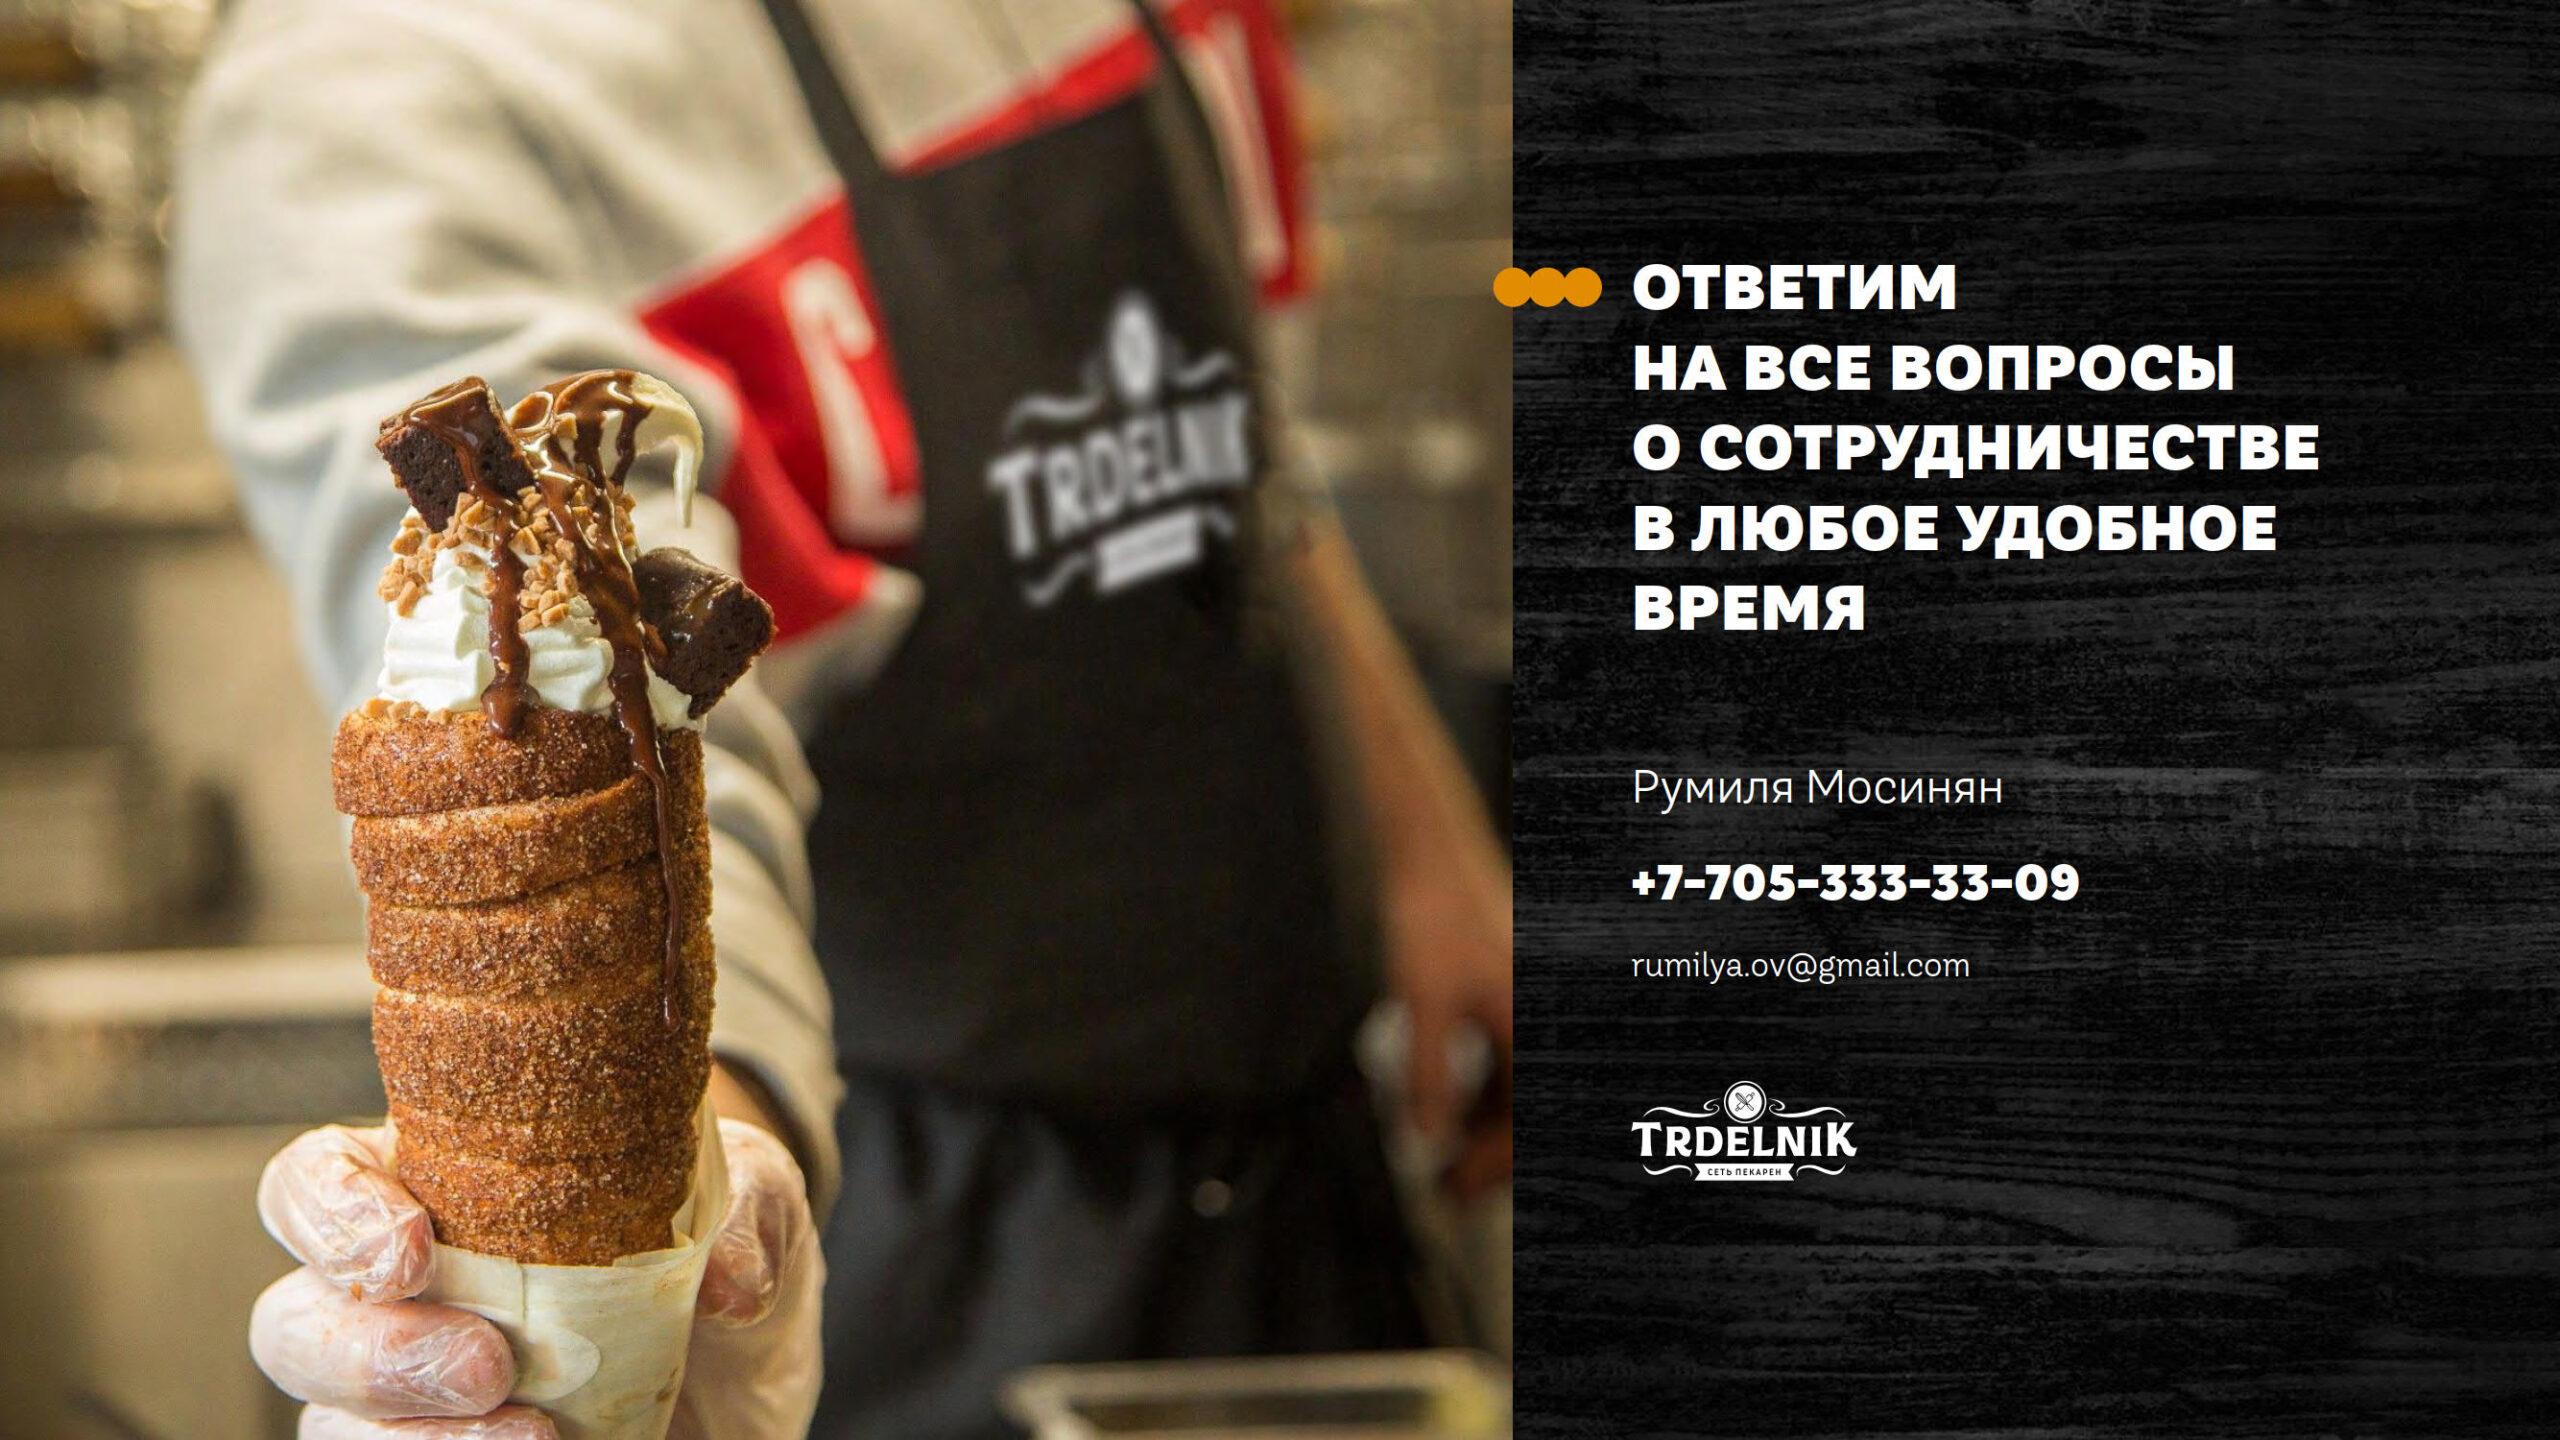 Презентация сети мини-пекарен Trdelnik для аренды в ТЦ